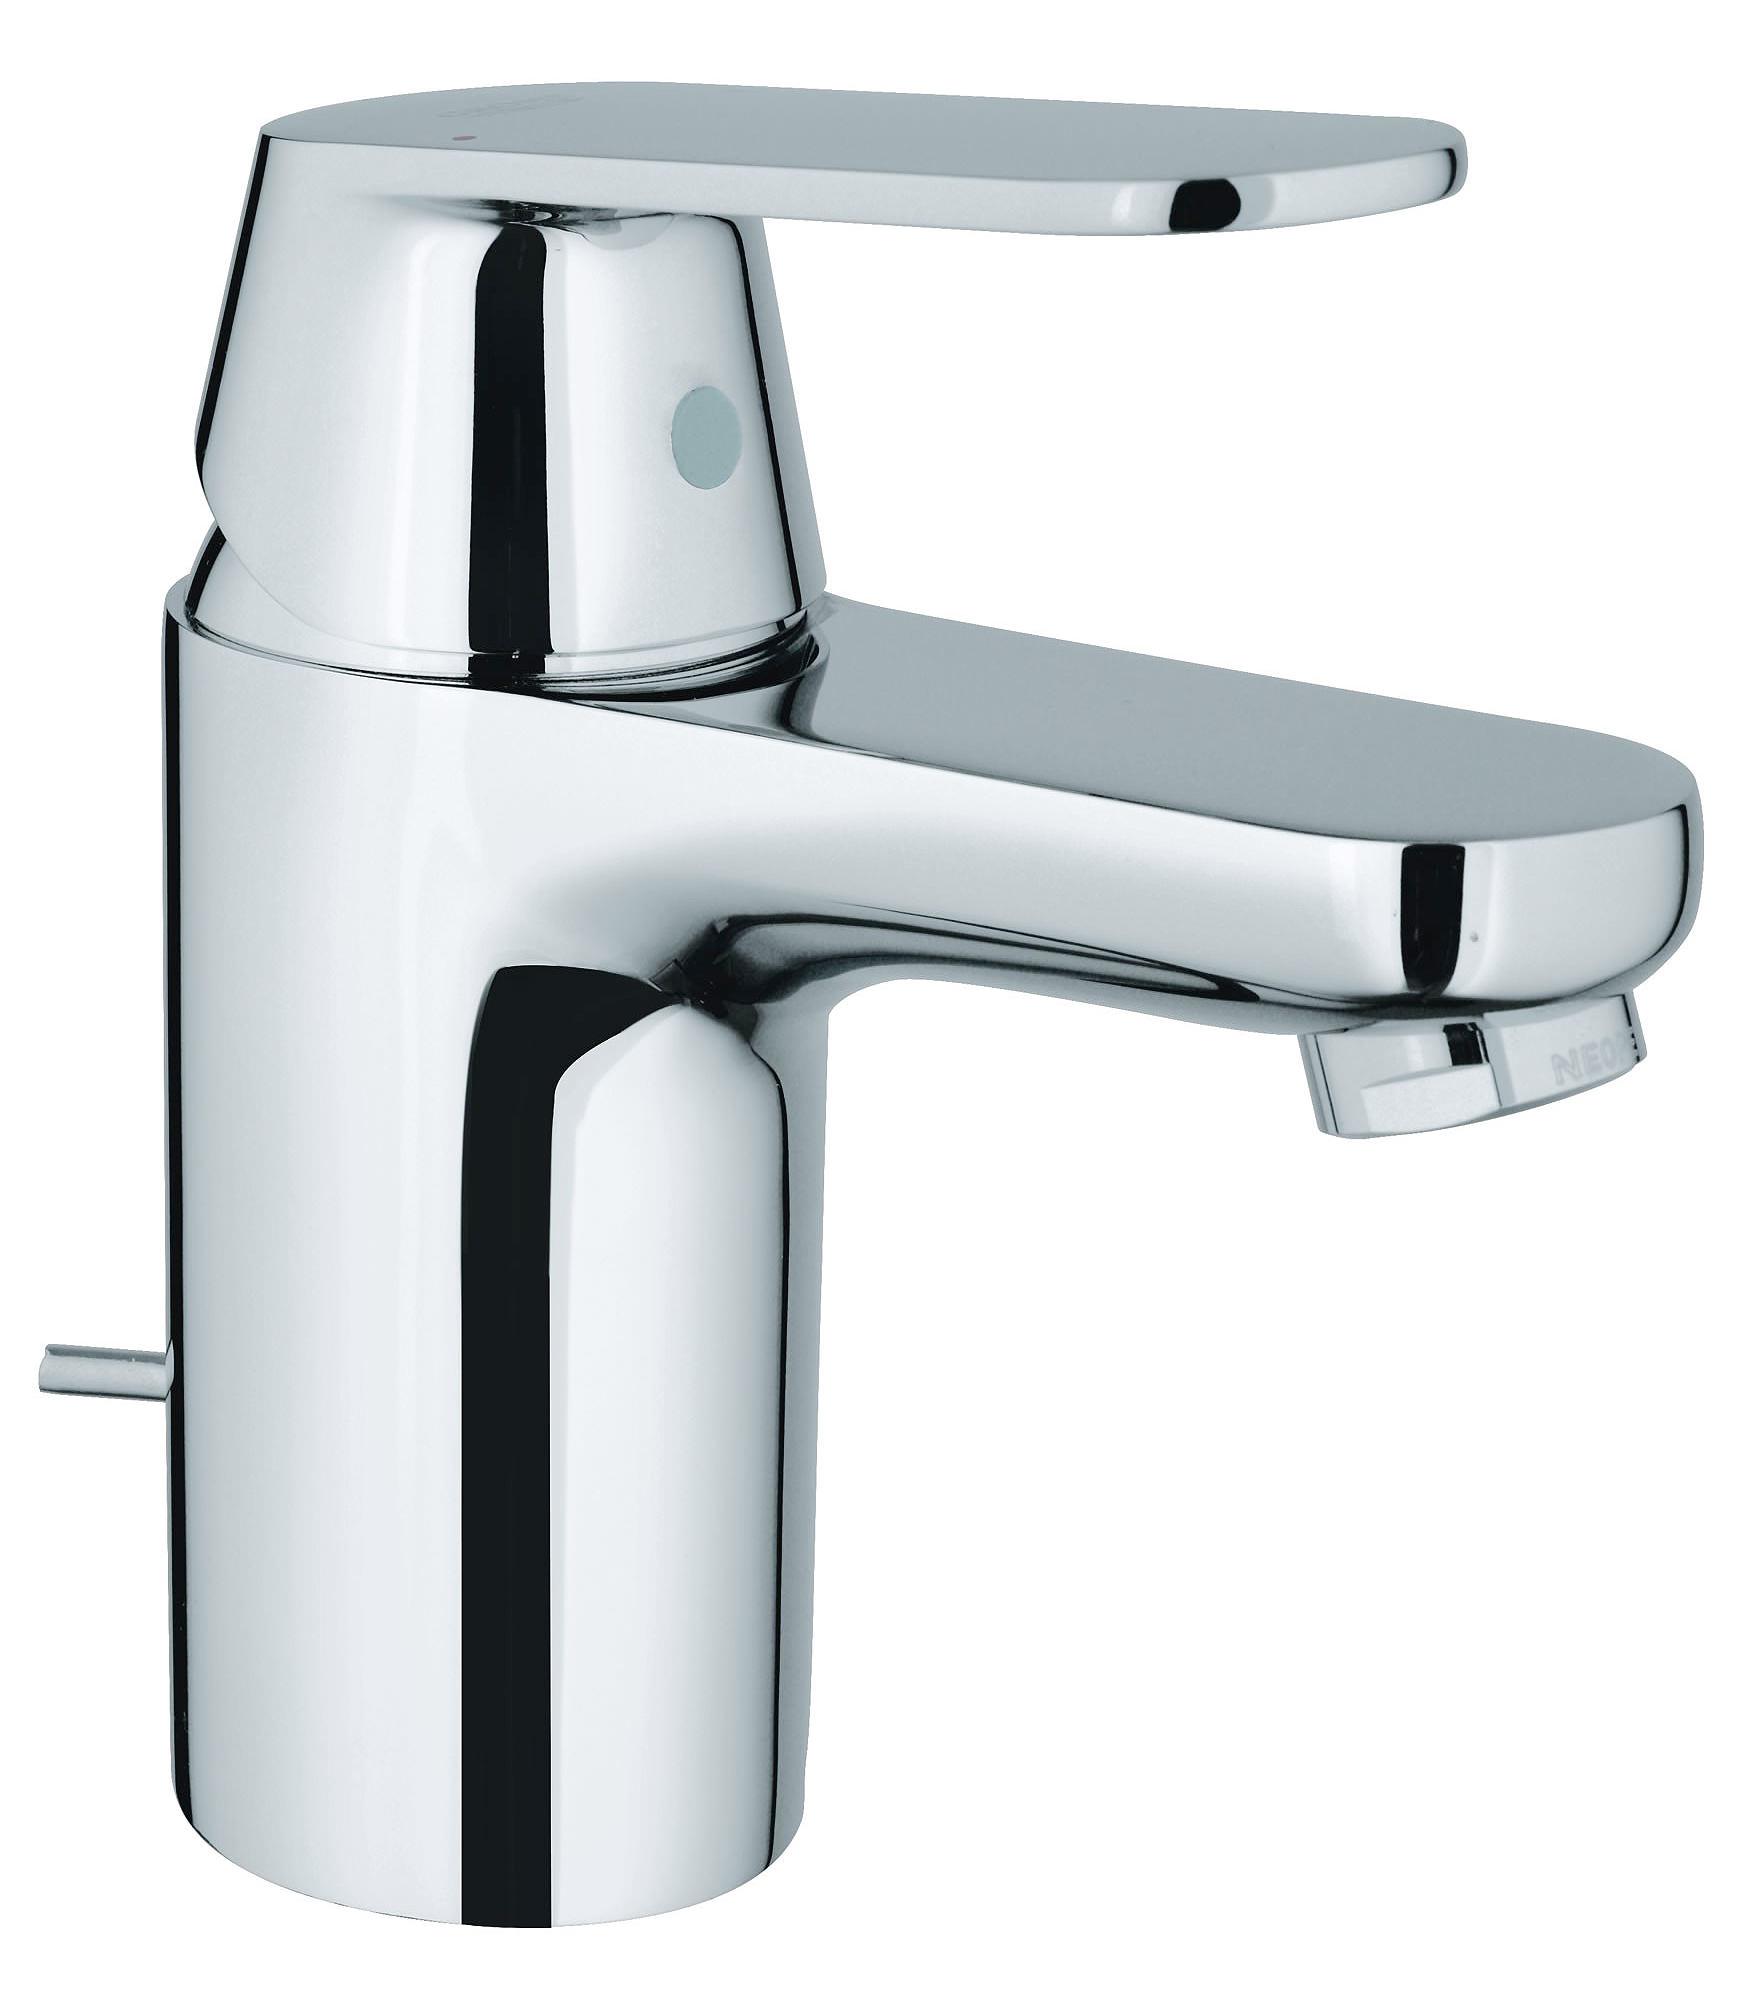 grohe eurosmart cosmopolitan basin mixer tap with pop up waste. Black Bedroom Furniture Sets. Home Design Ideas